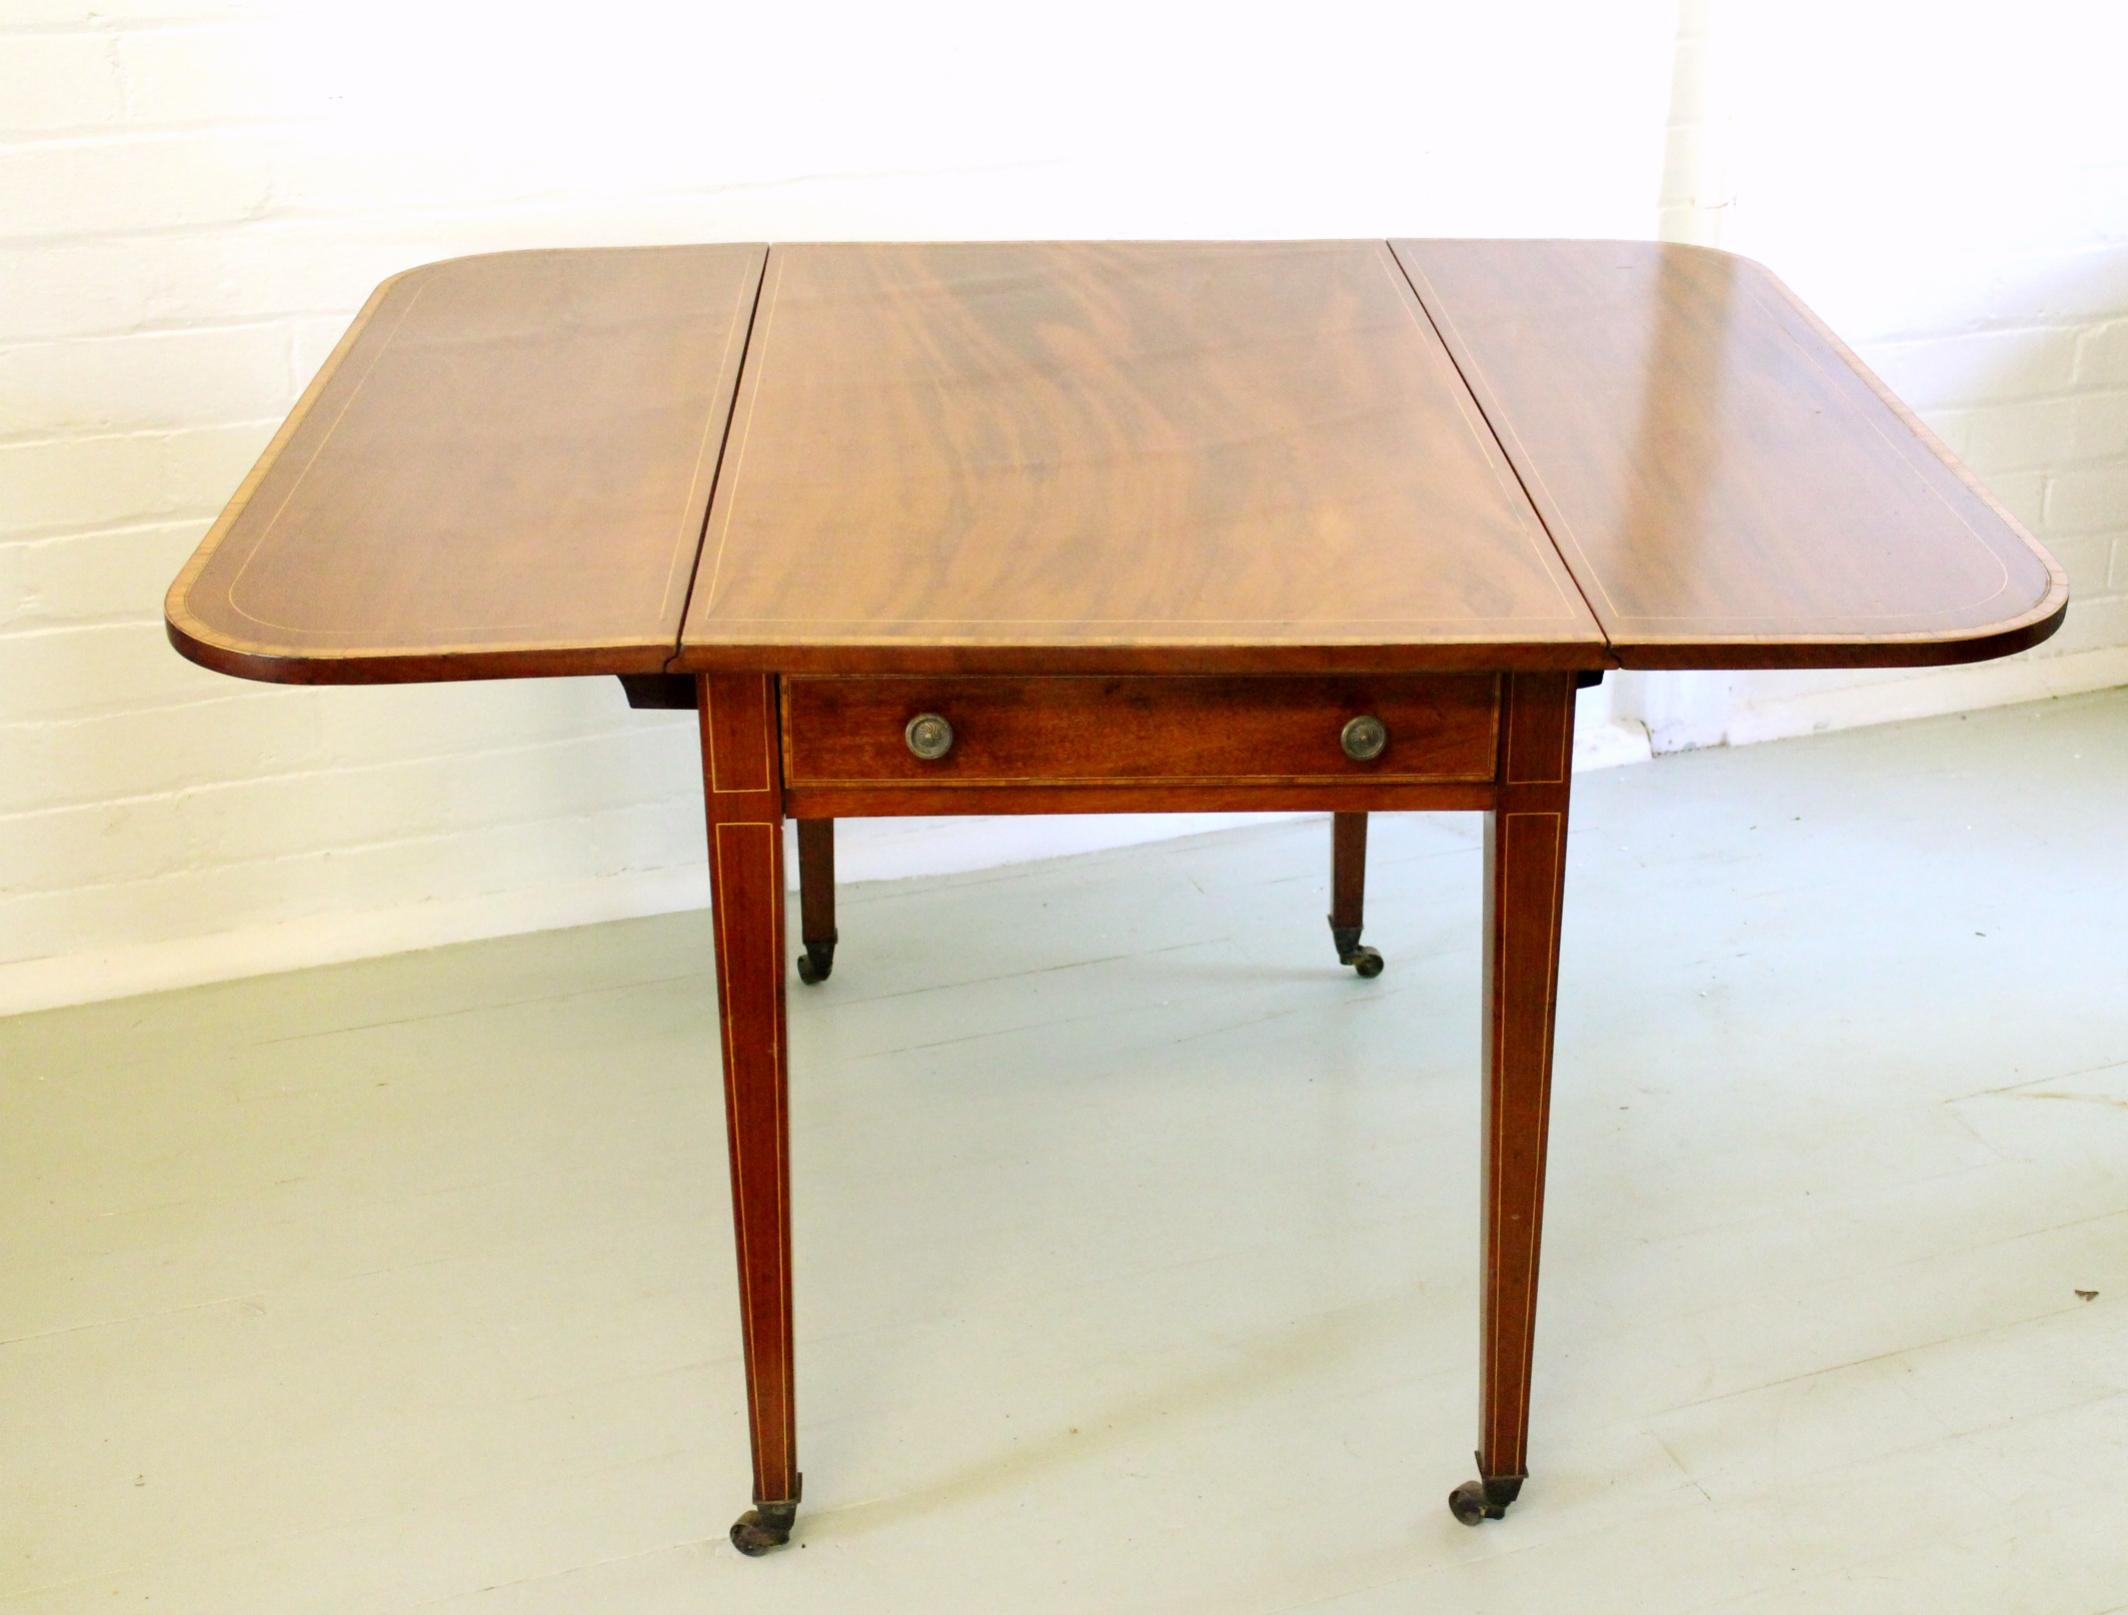 Antique Pembroke Table.jpg.jpg